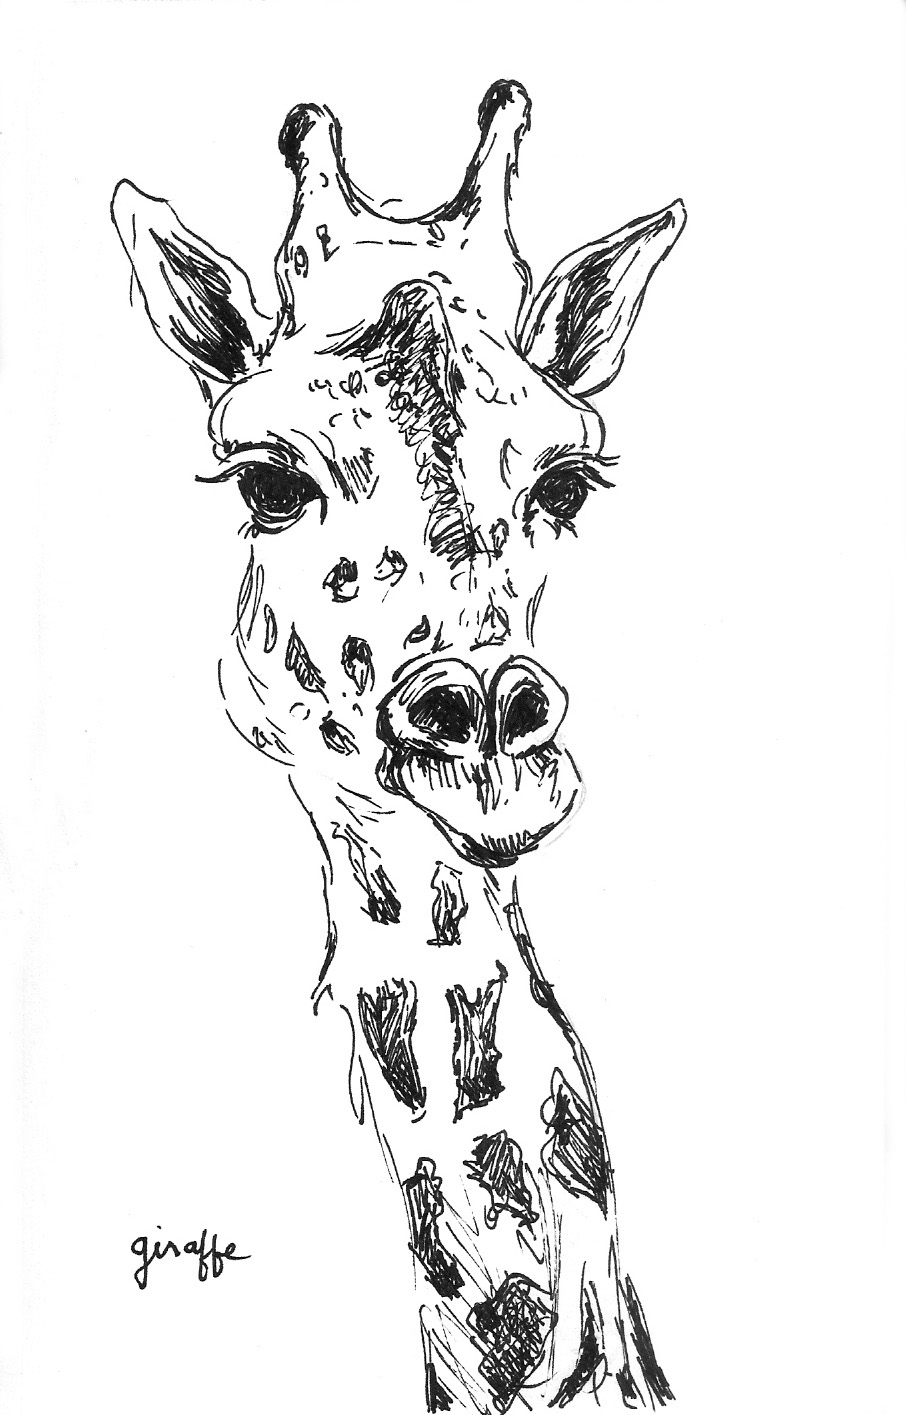 1-giraffe-gloriaho.jpg